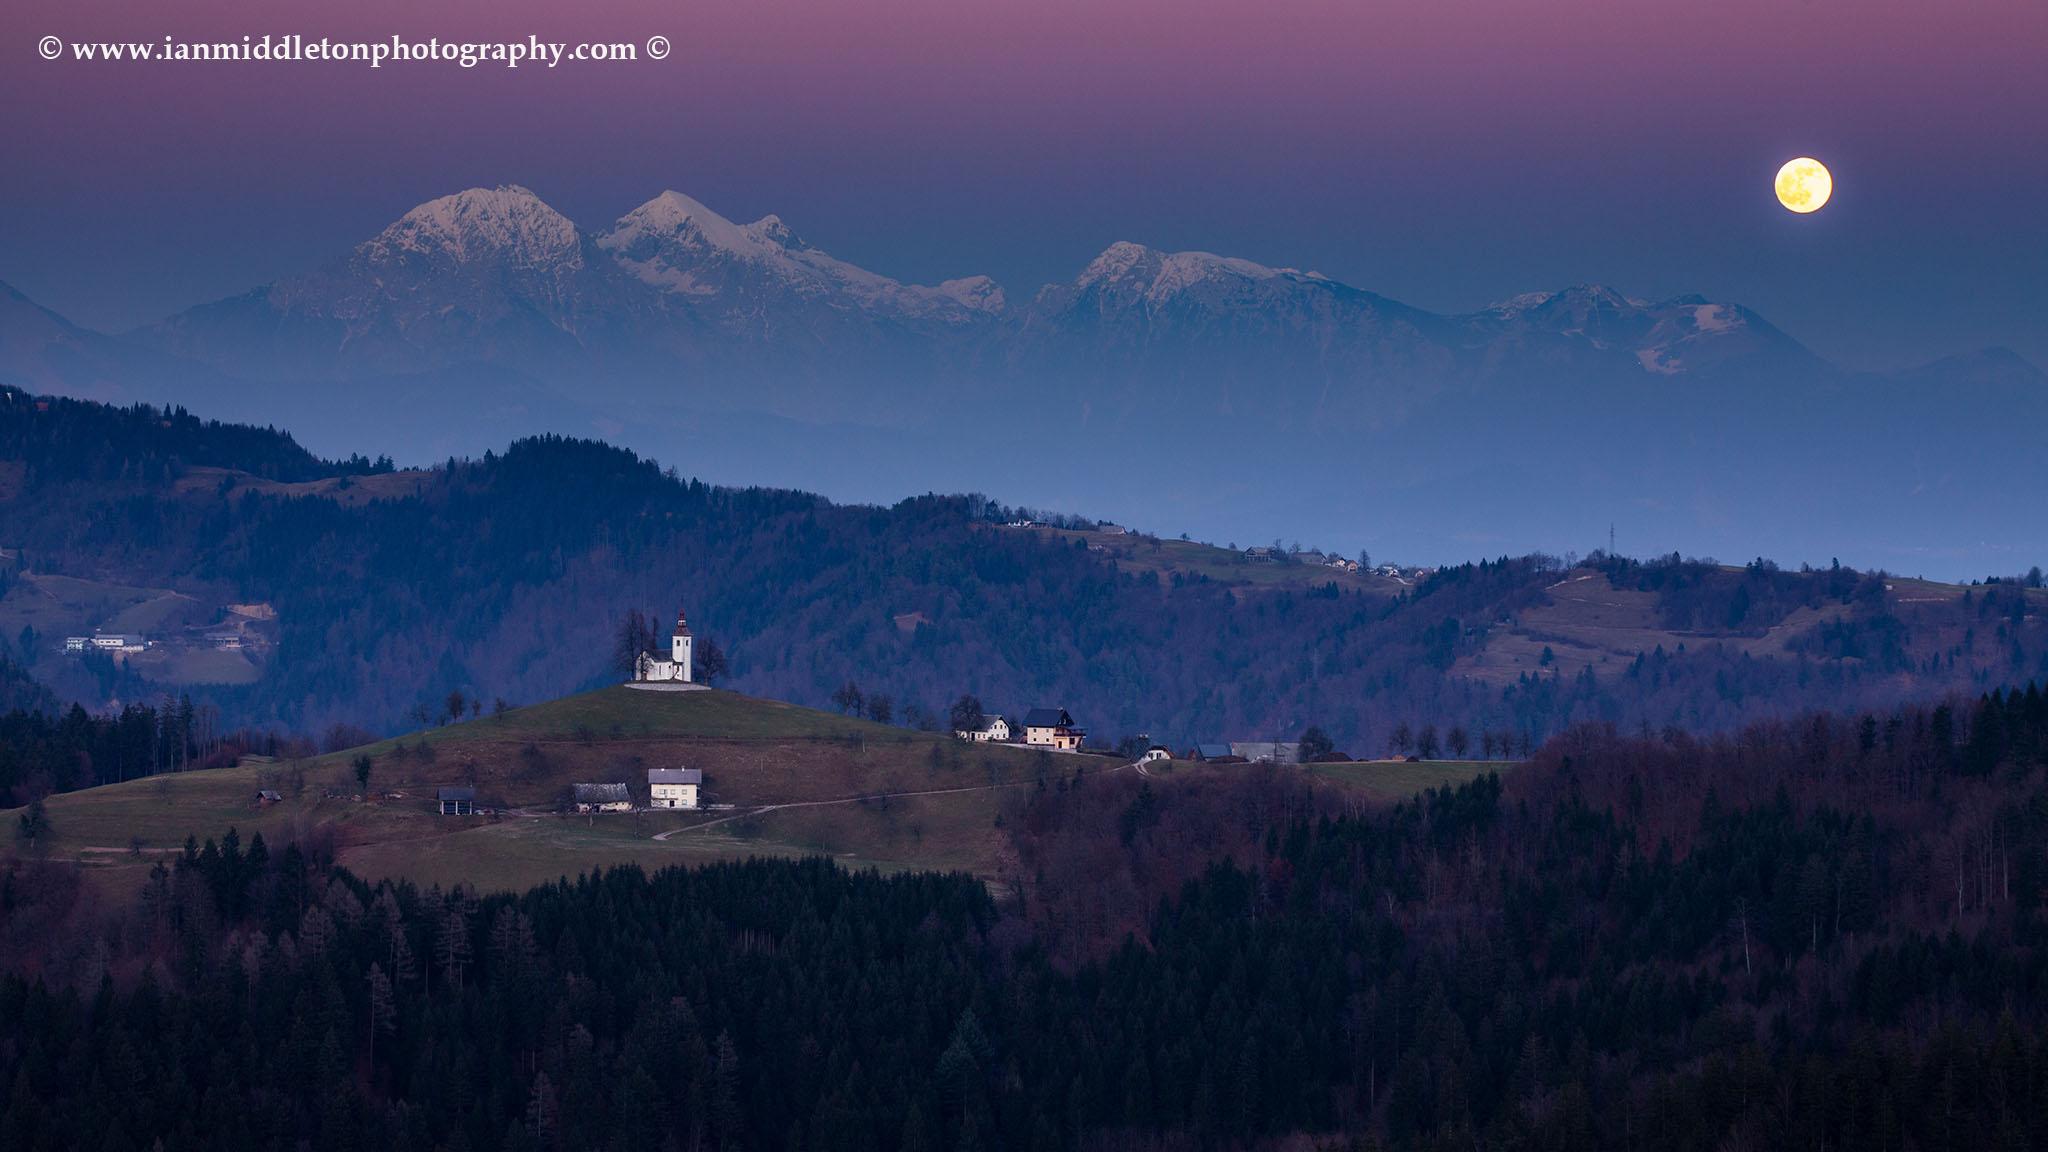 The full moon rising in winter over the mountains behind Sveti Tomaz nad Praprotnim (church of Saint Thomas) and the Kamnik Alps, Slovenia.